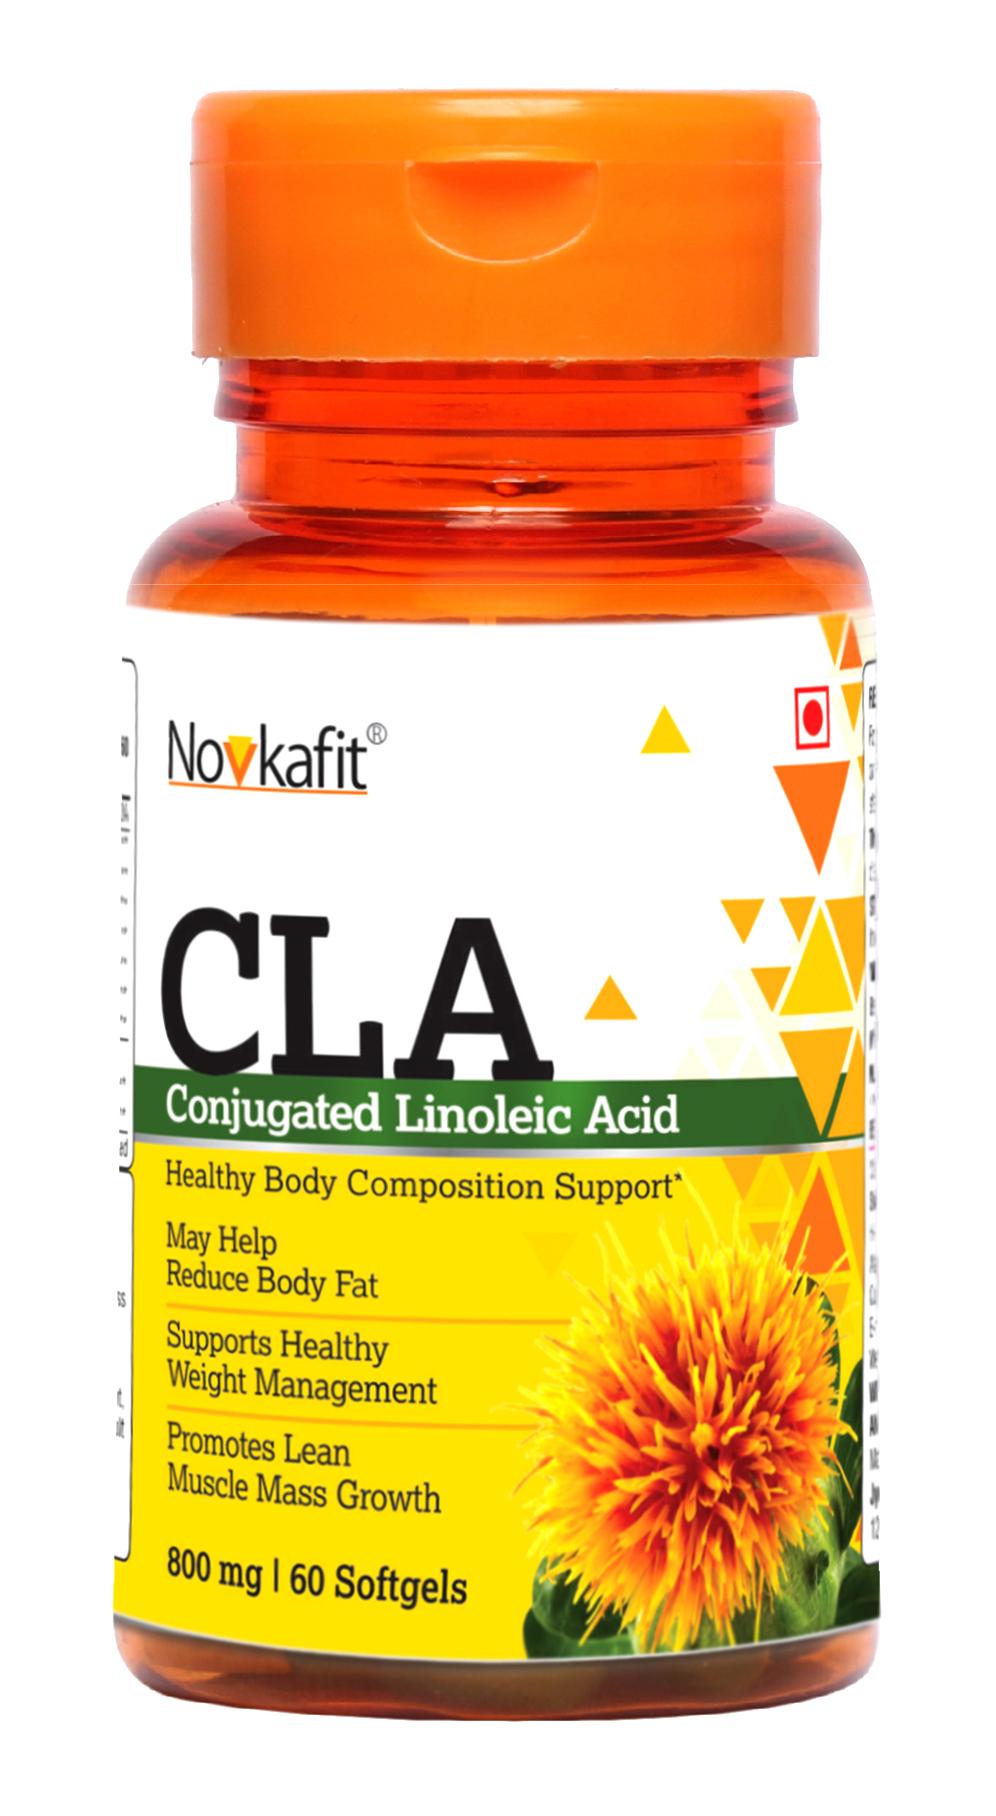 Novkafit CLA 1000, Conjugated Linoleic Acid   60 Softgel Capsules